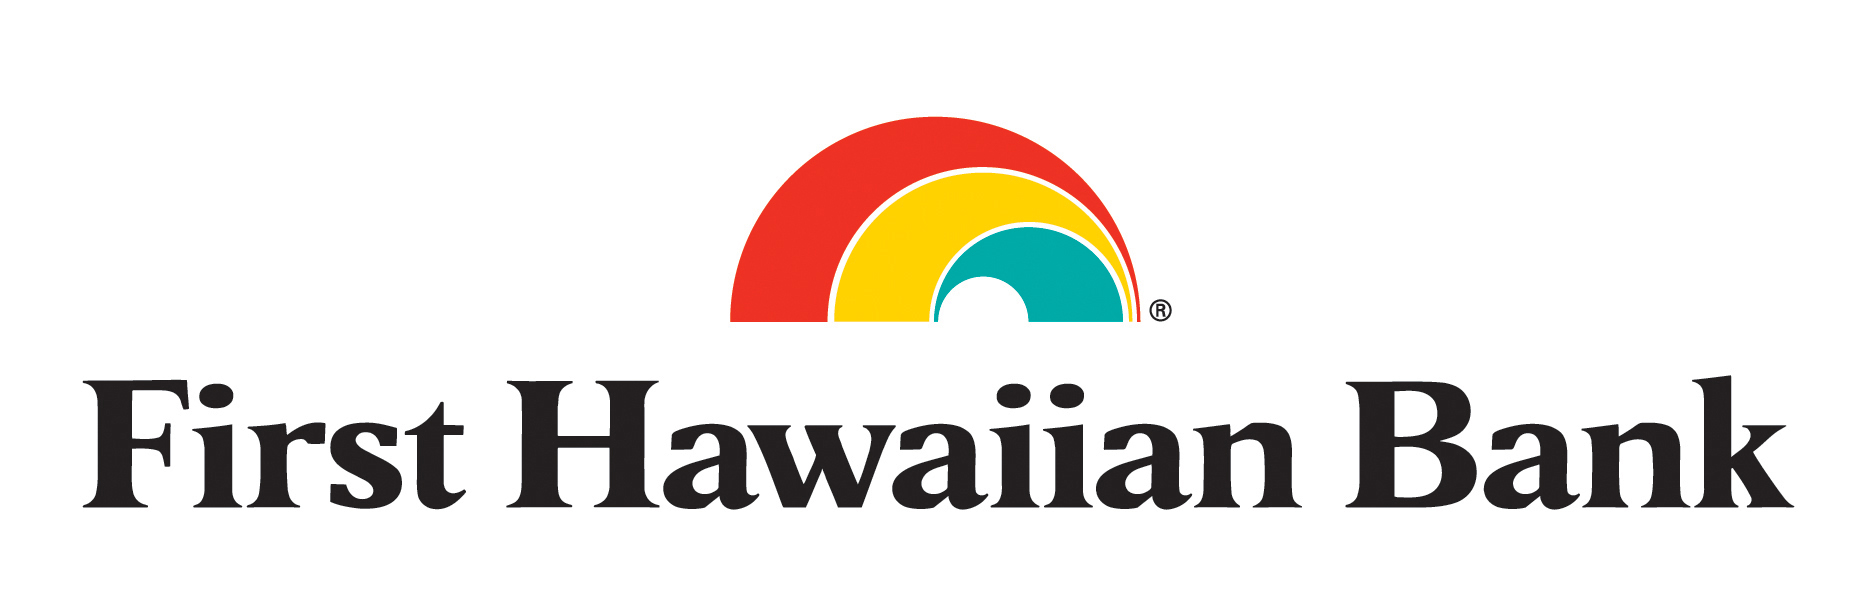 first-hawaiian-inc-fhb-shares-up-26.jpg